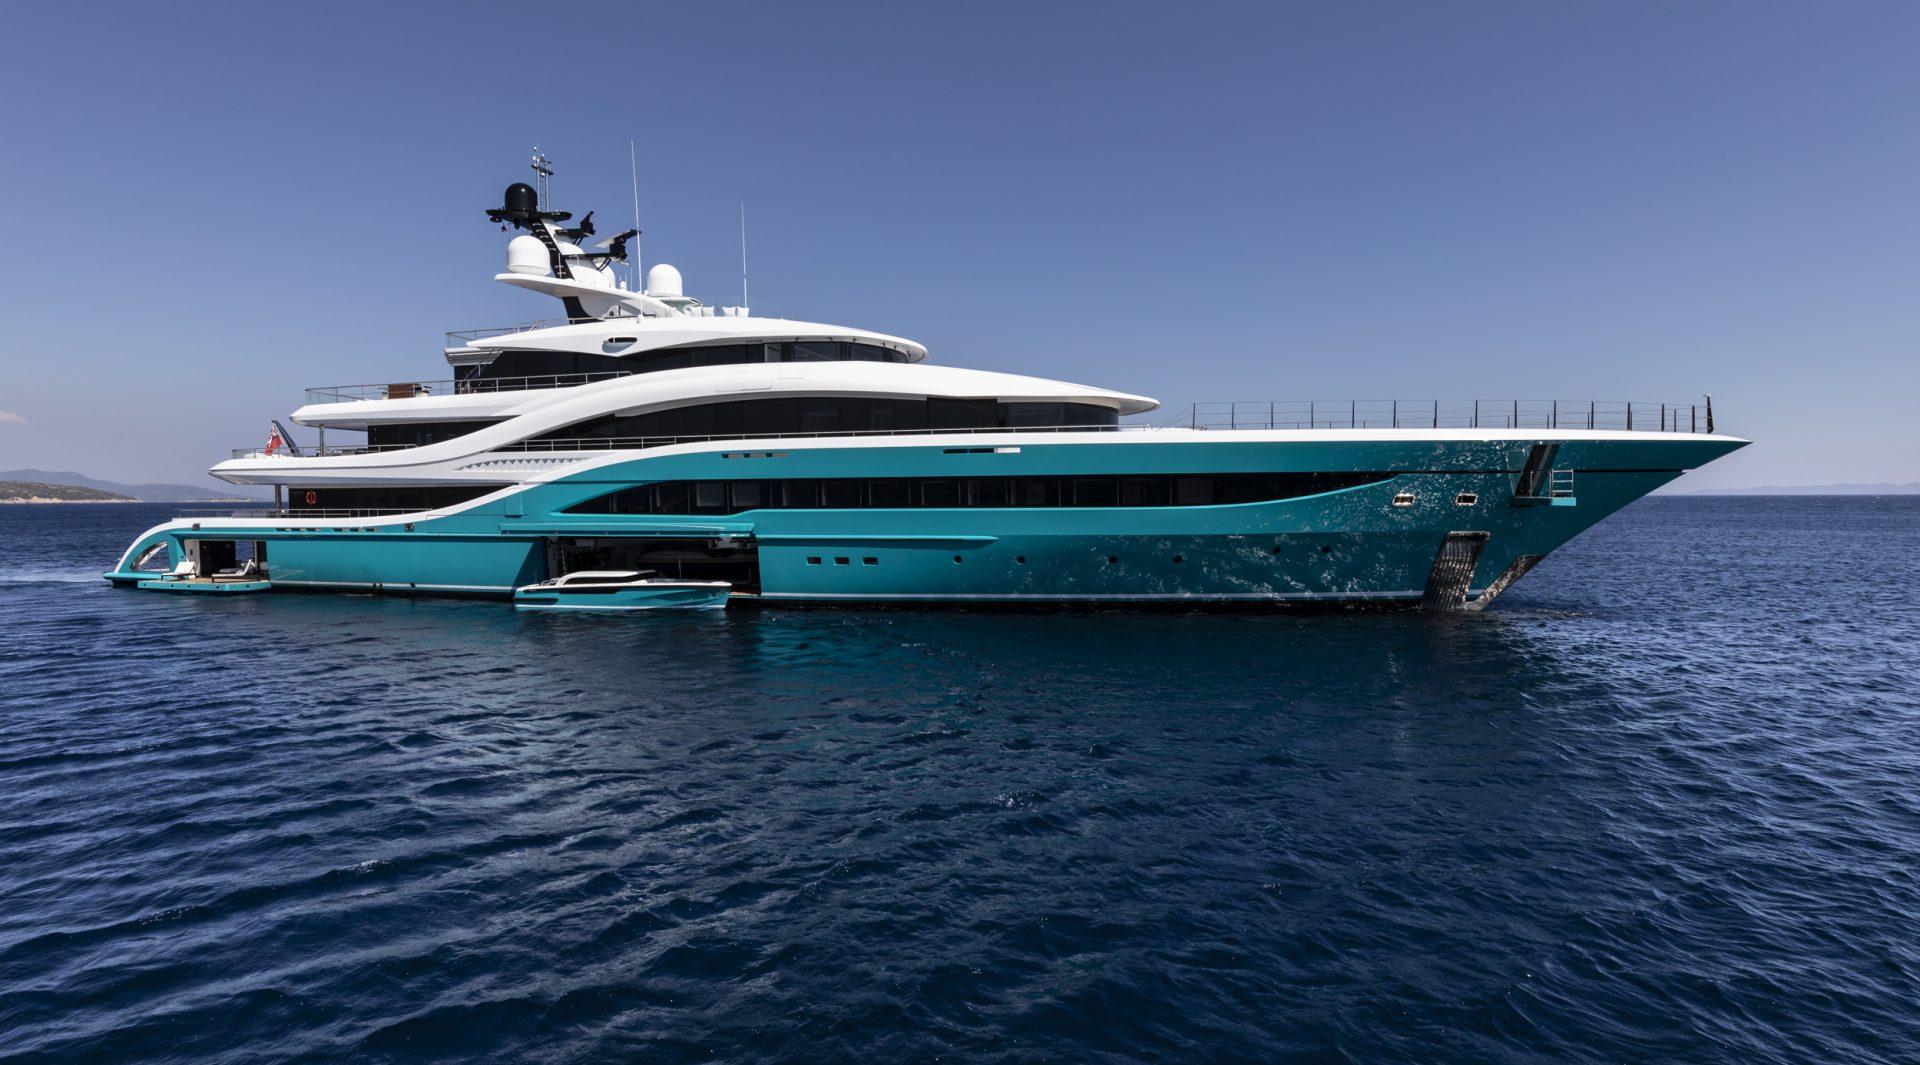 Turquoise Yachts